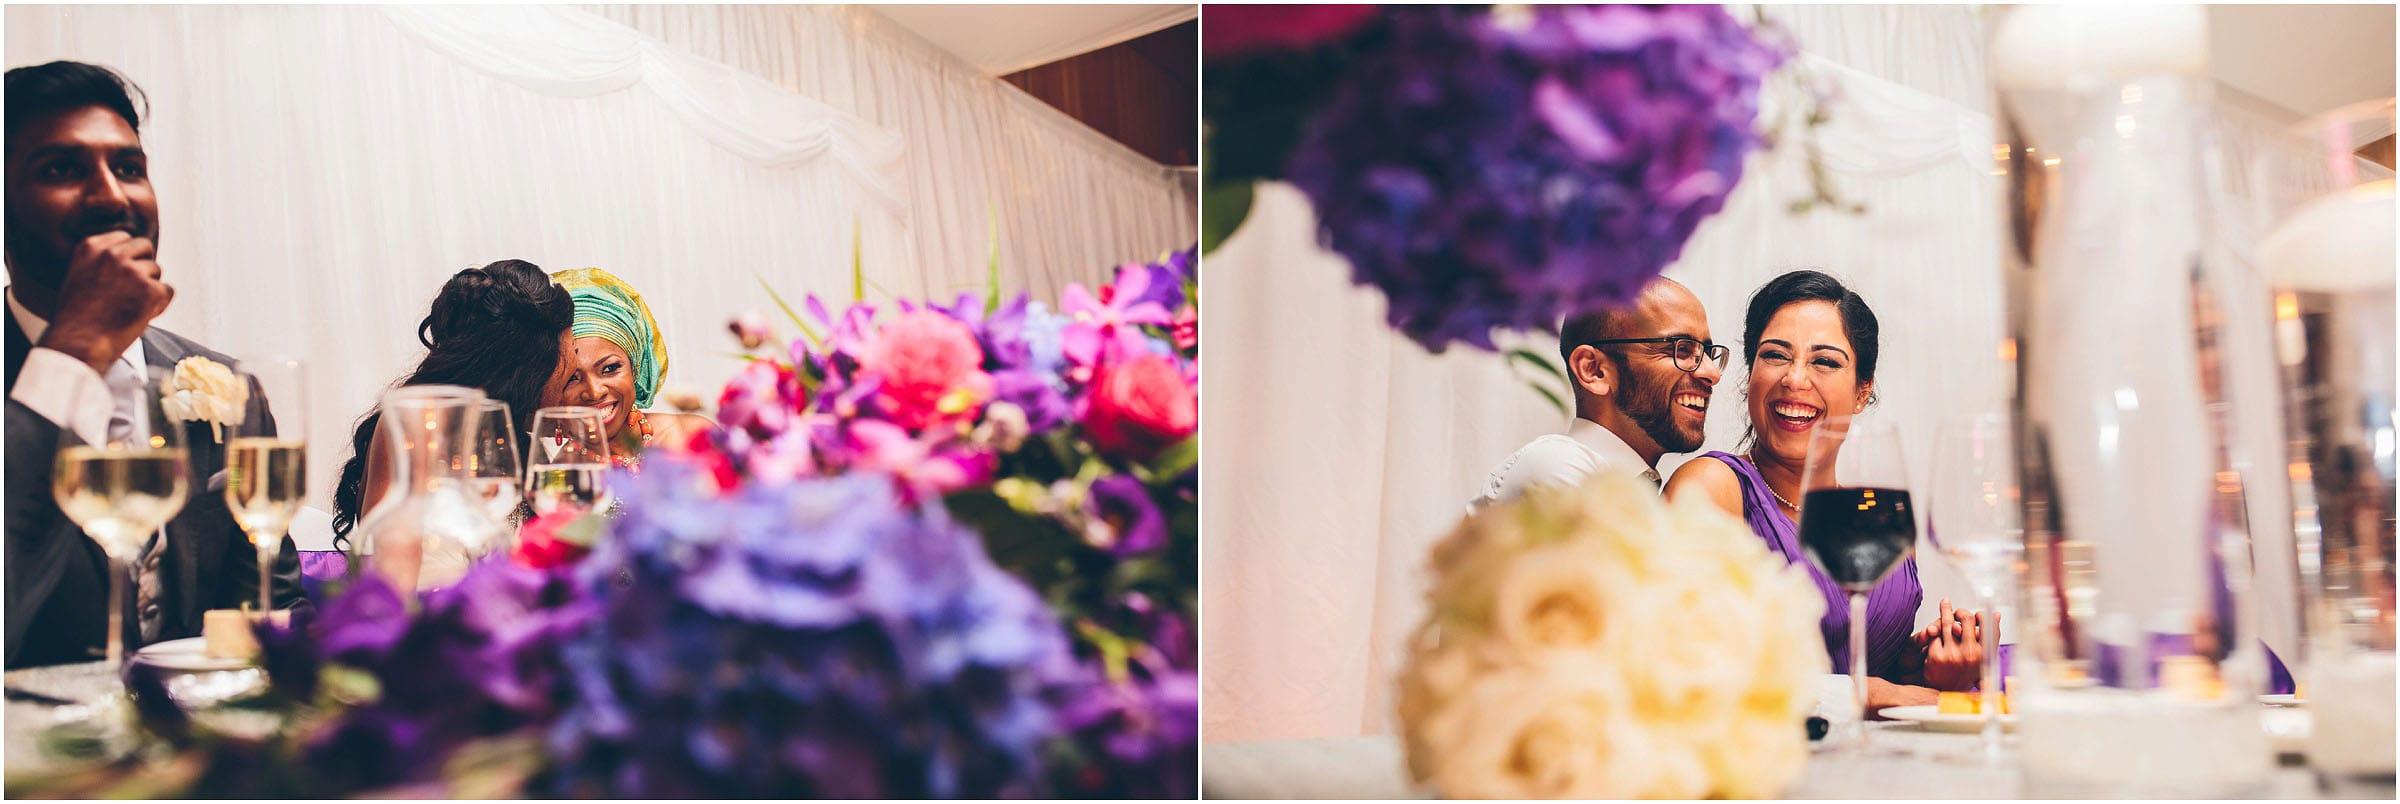 Hilton_Manchester_Wedding_Photography_0113